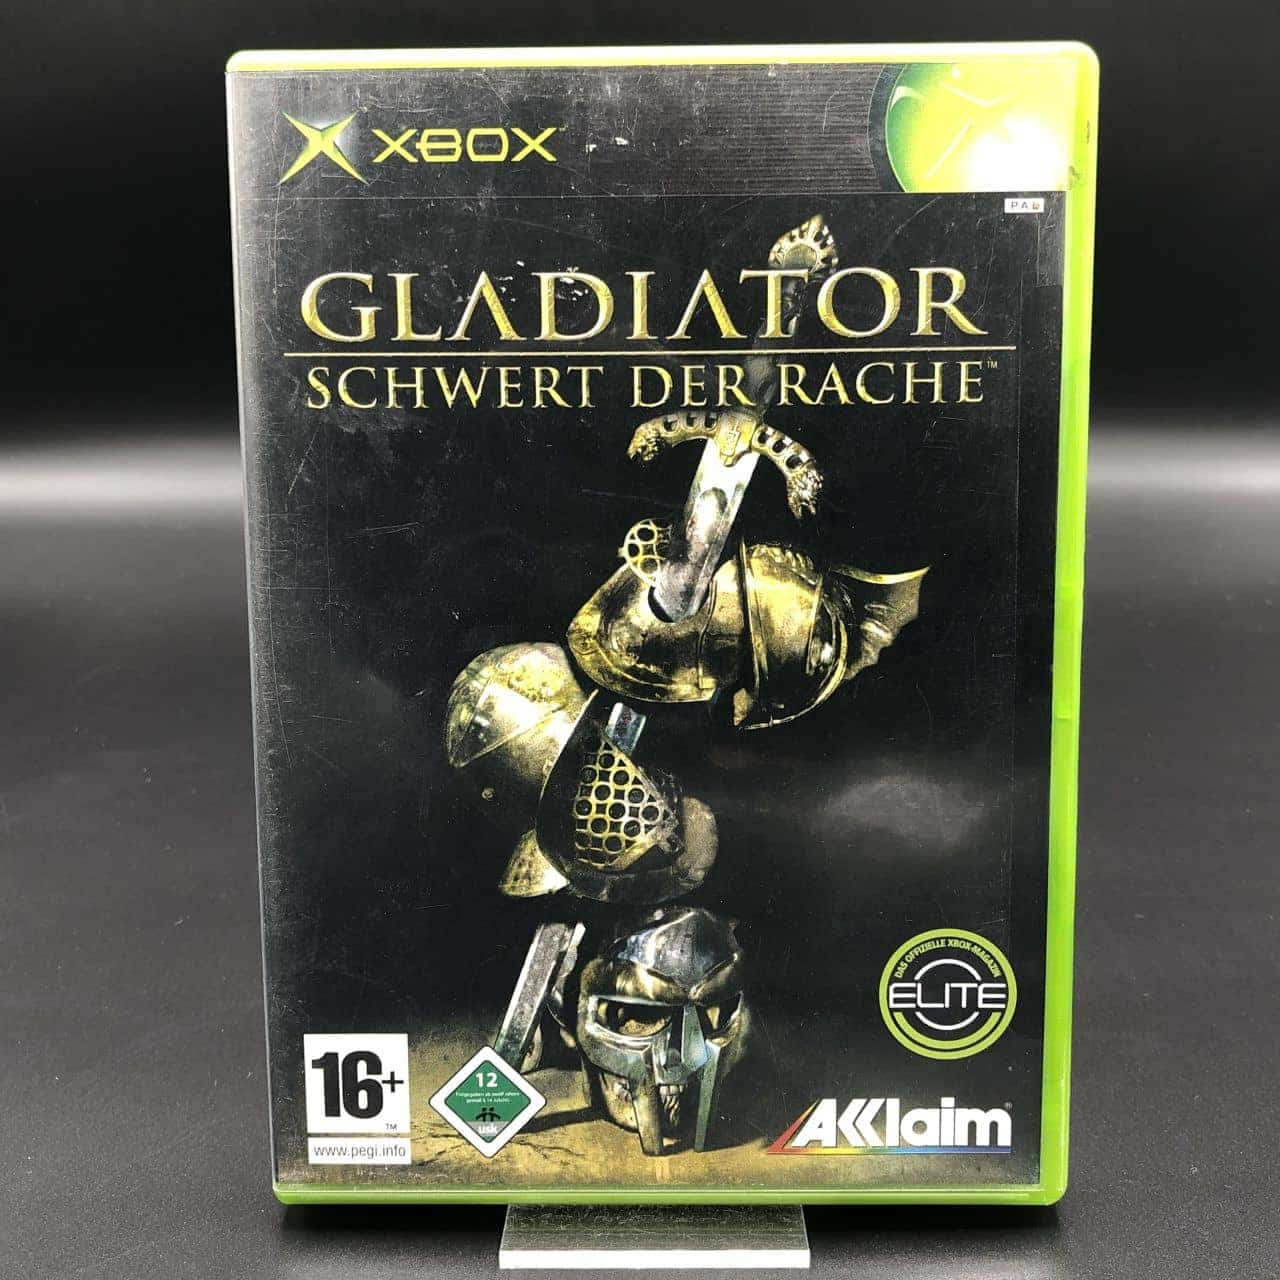 XBC Gladiator: Schwert der Rache (Komplett) (Gut) Microsoft Xbox Classic